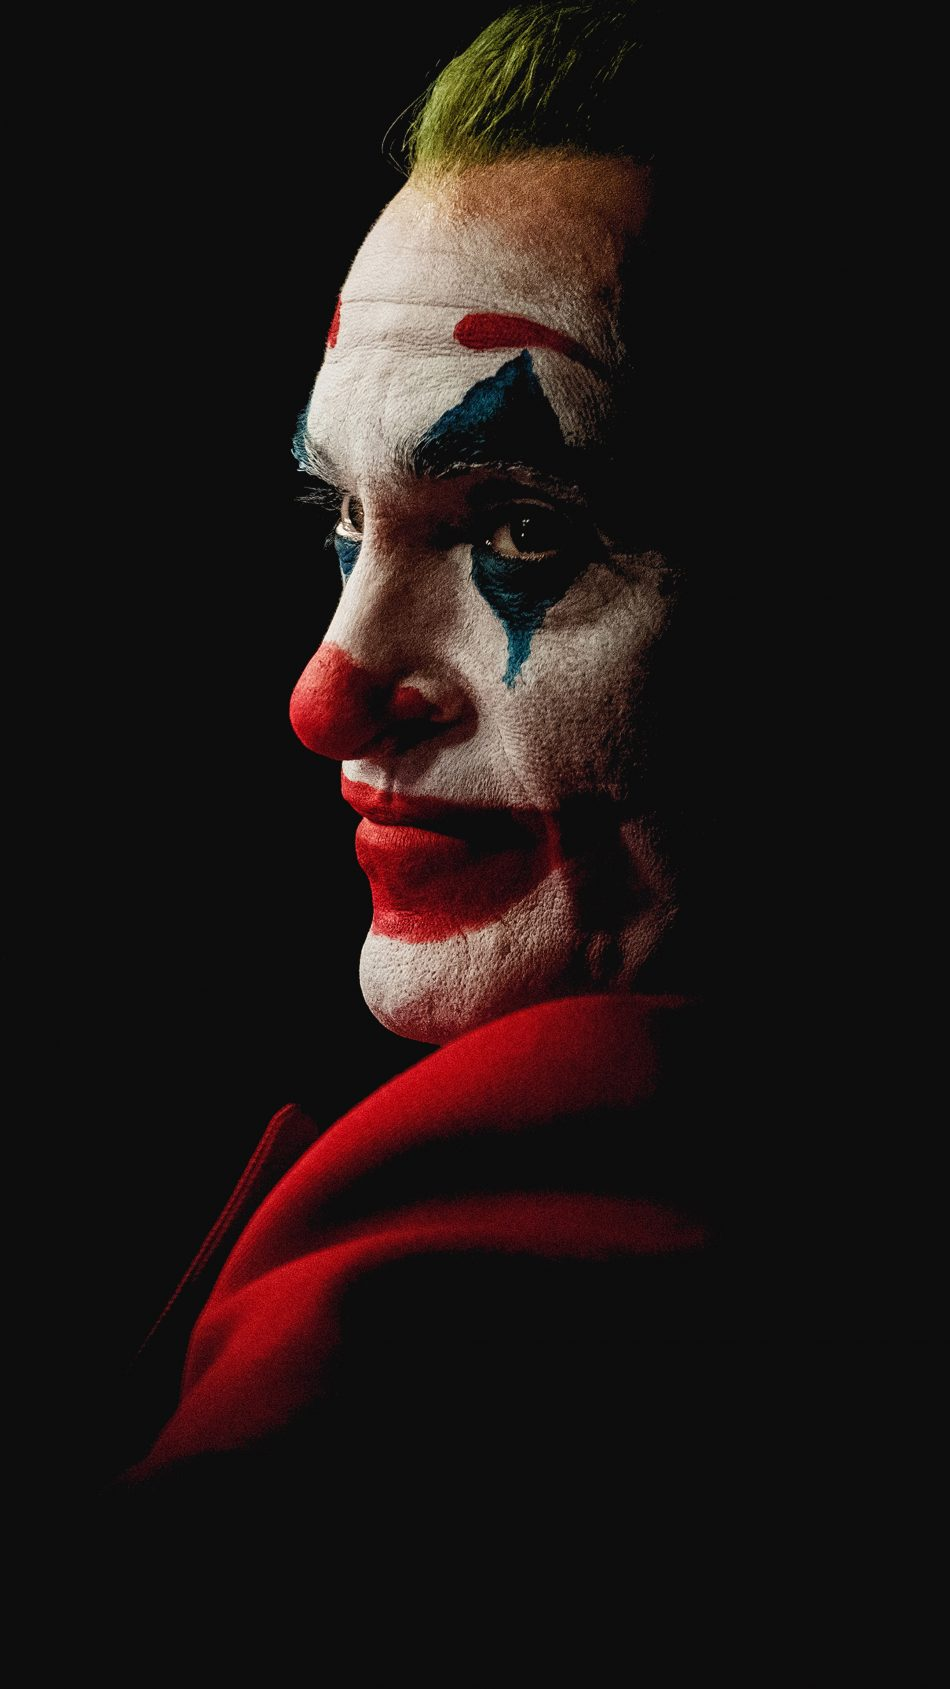 Joaquin Phoenix Joker Black Background джокер готэм и